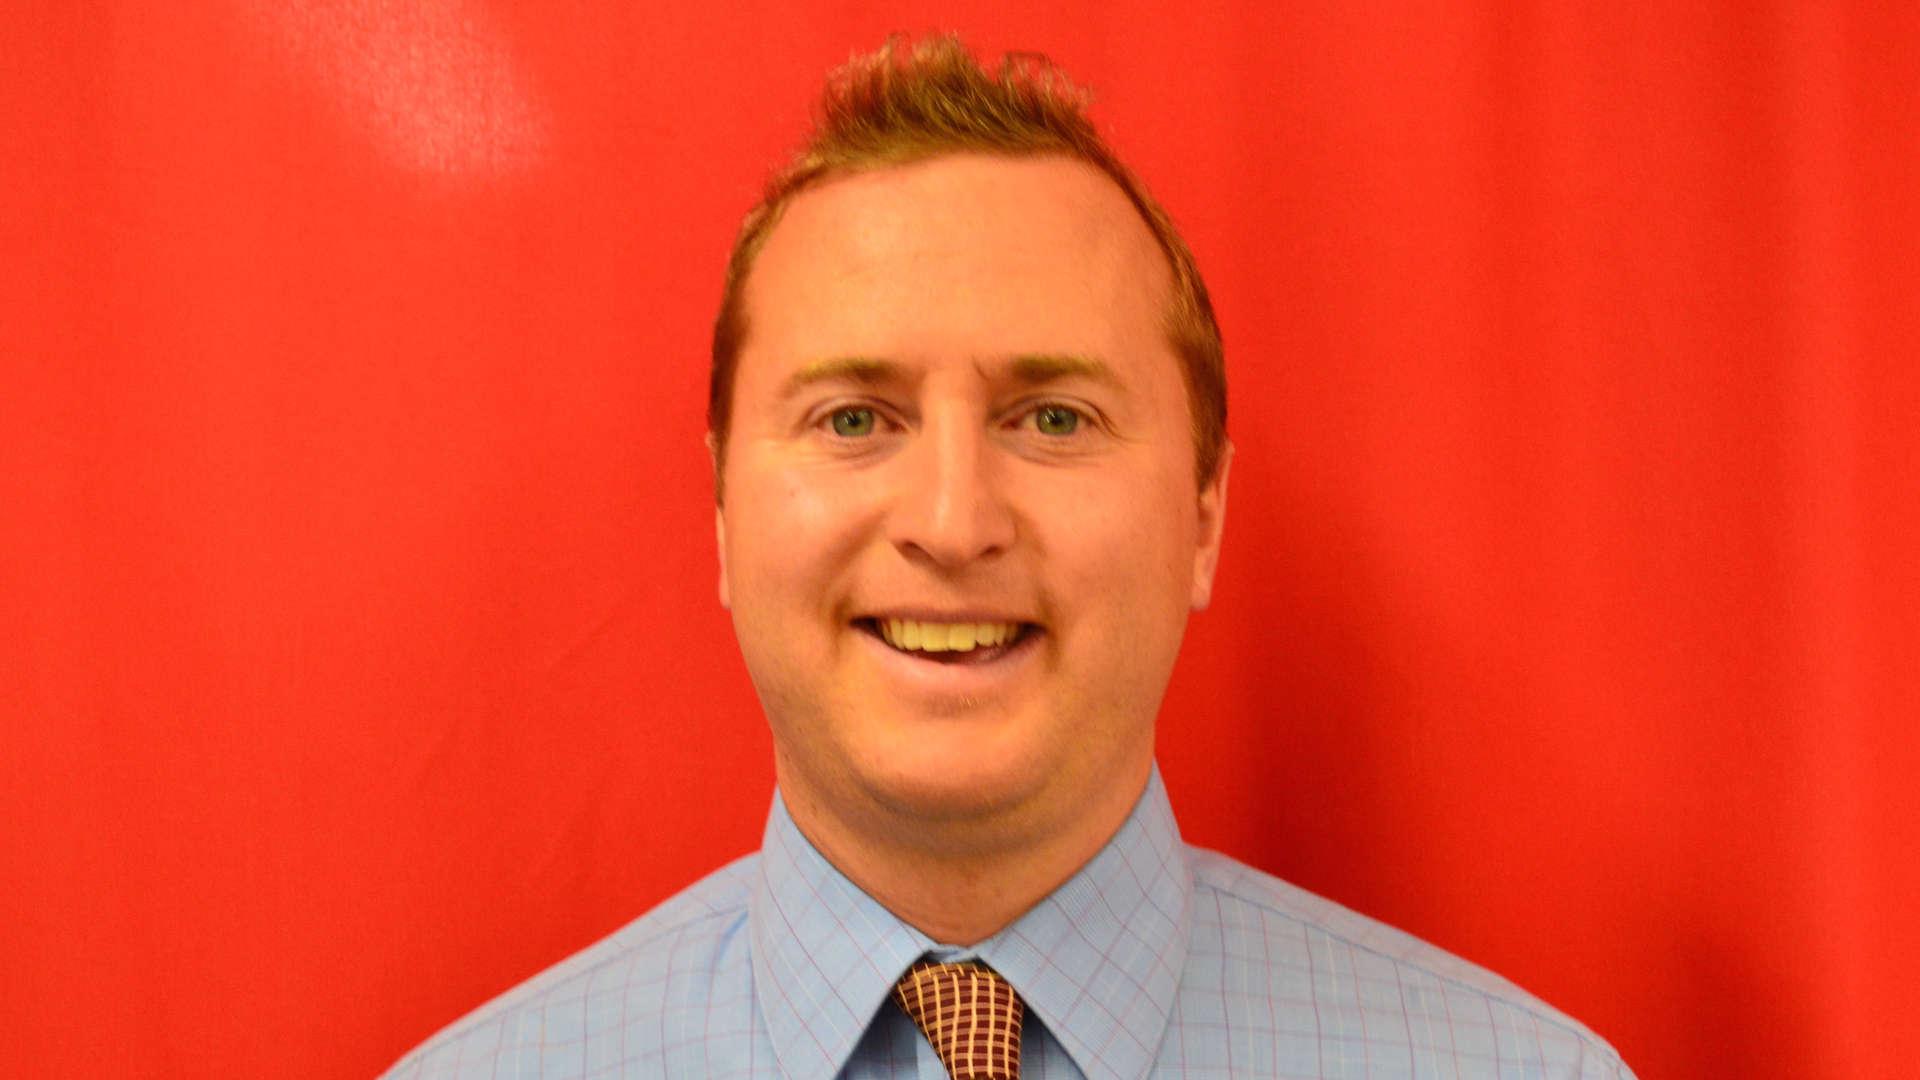 Jared Hardman - Principal